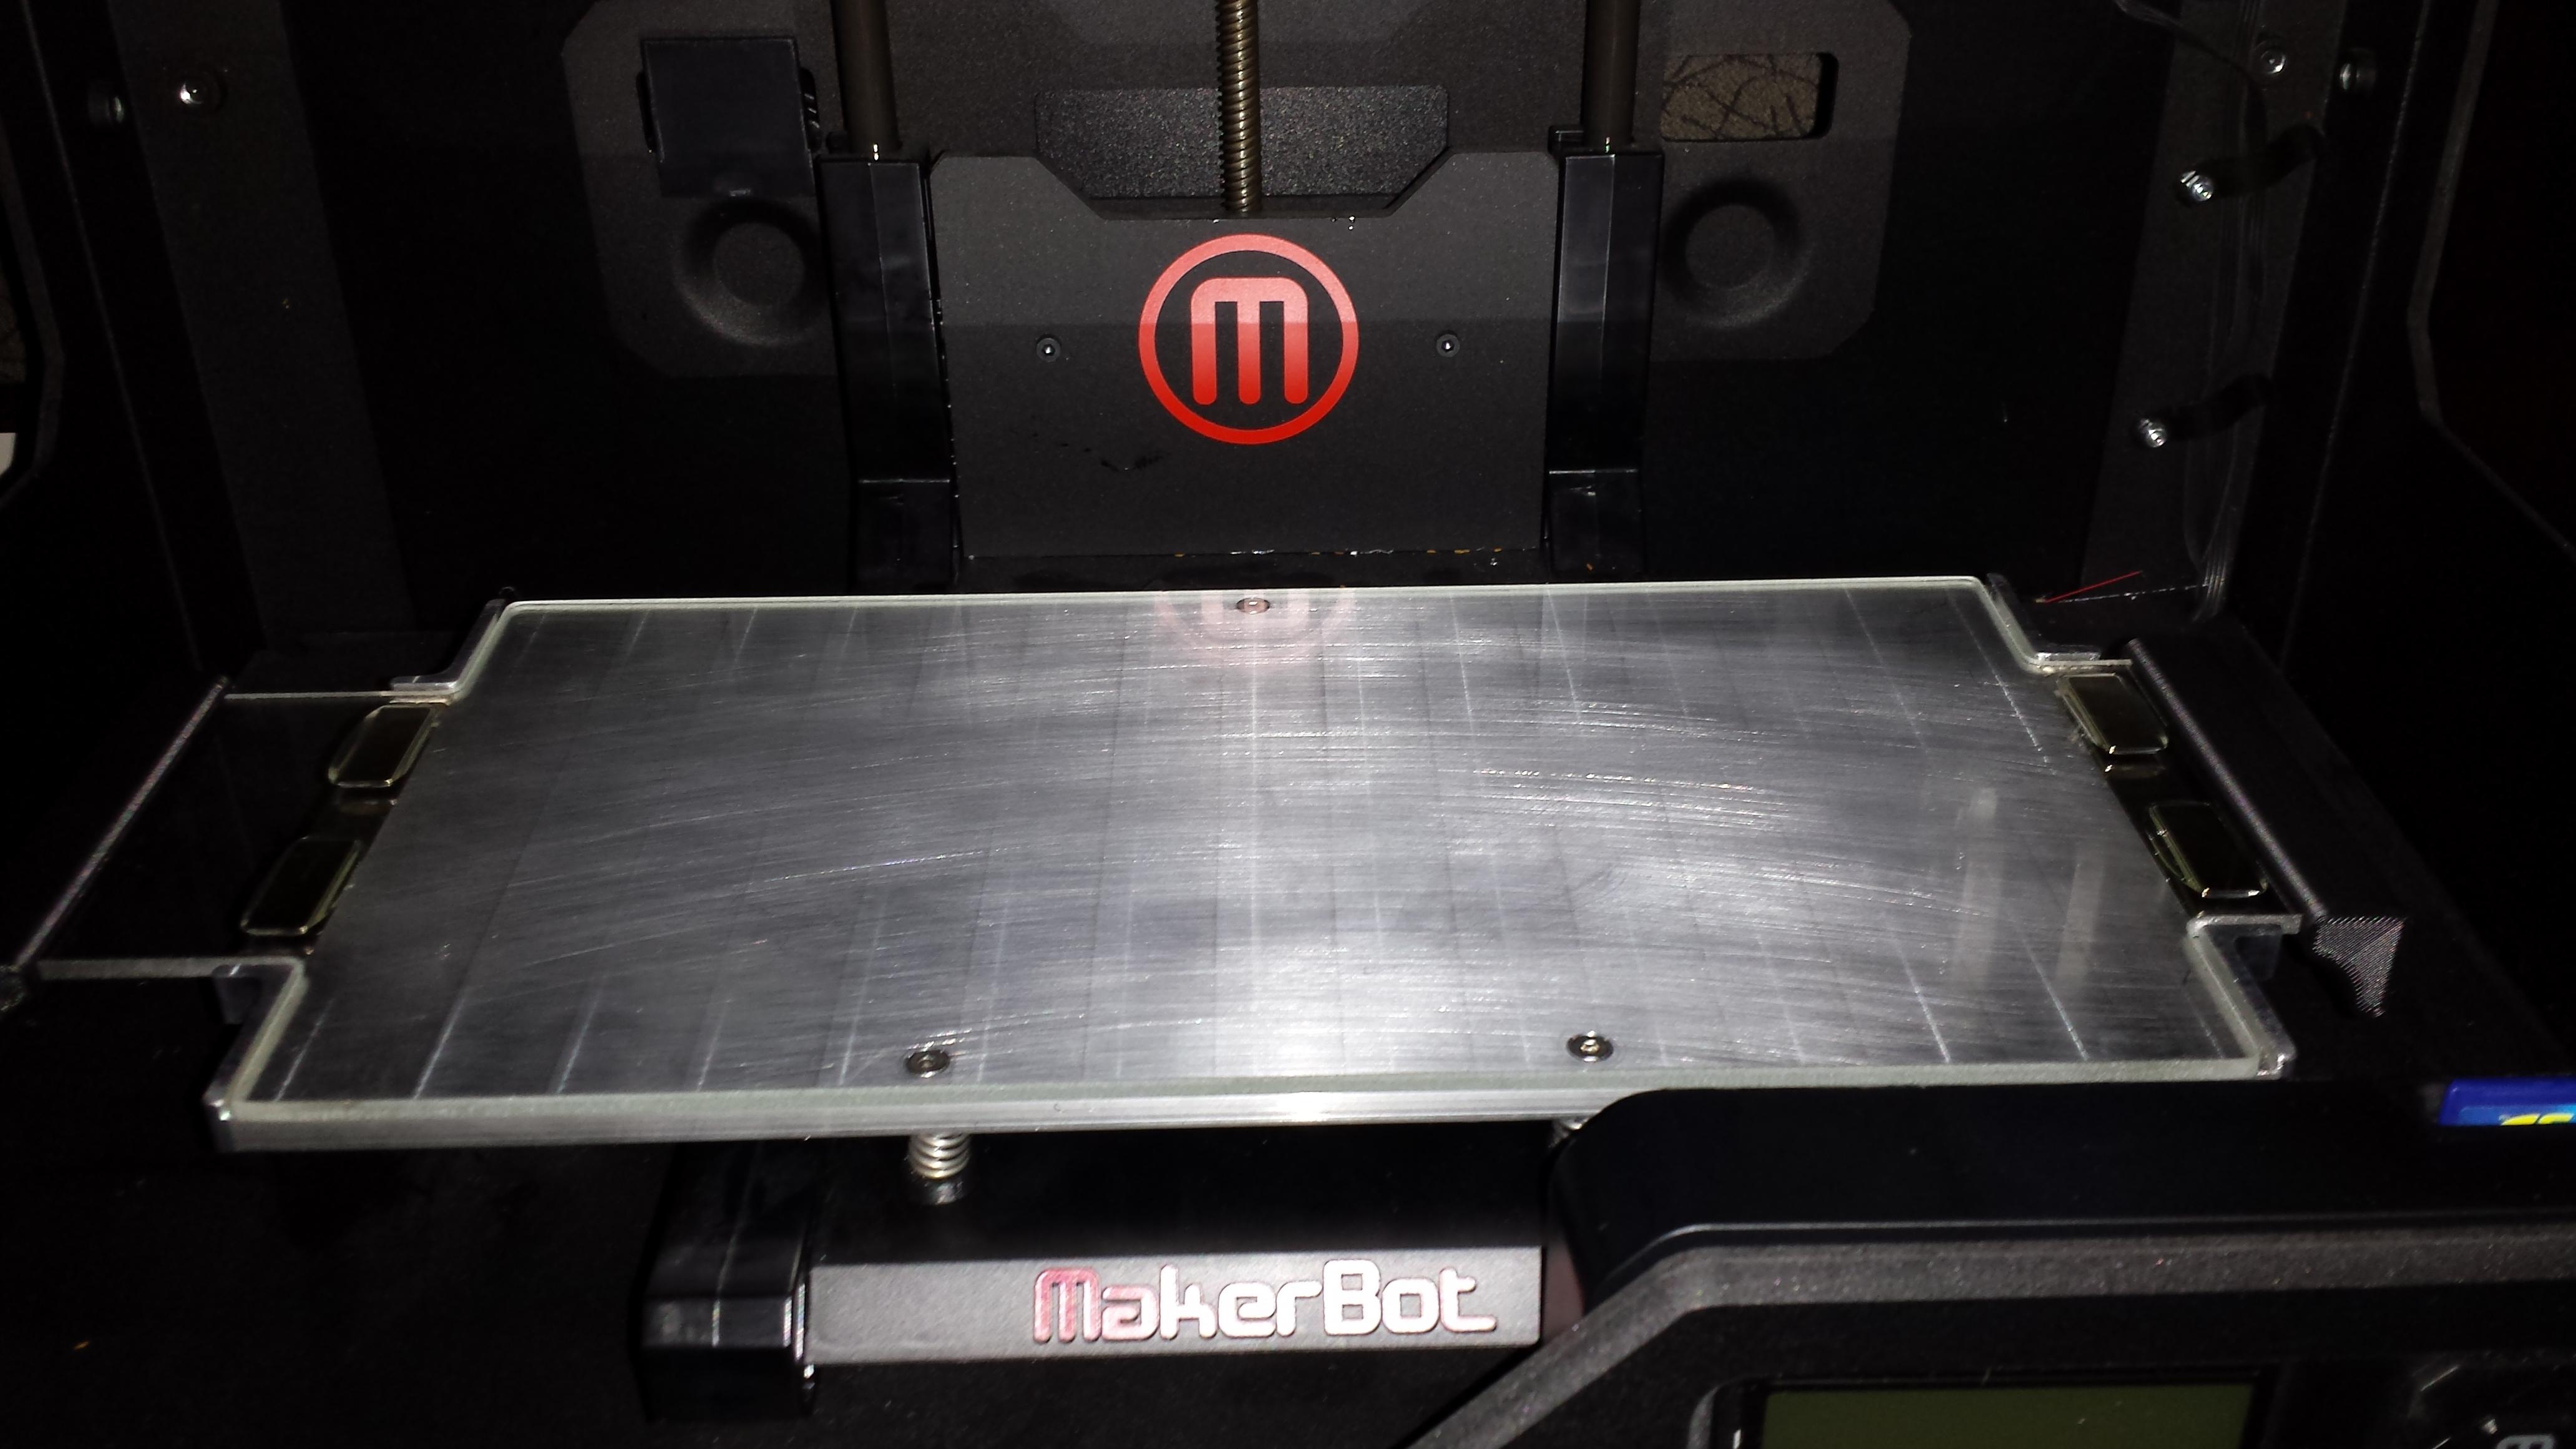 Makerbot replicator 2 heated platform